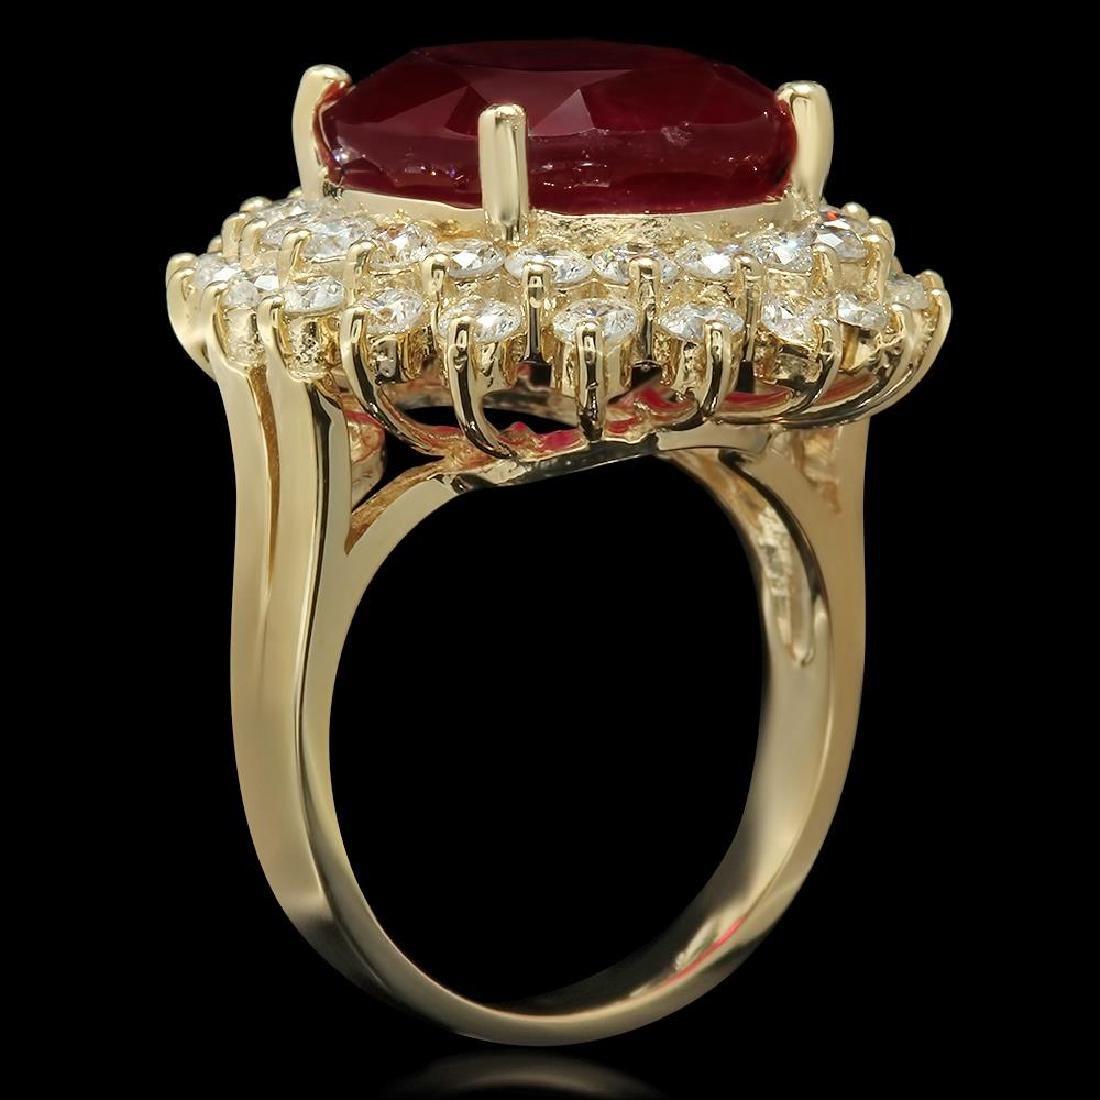 14K Gold 14.38ct Ruby 2.38ct Diamond Ring - 2